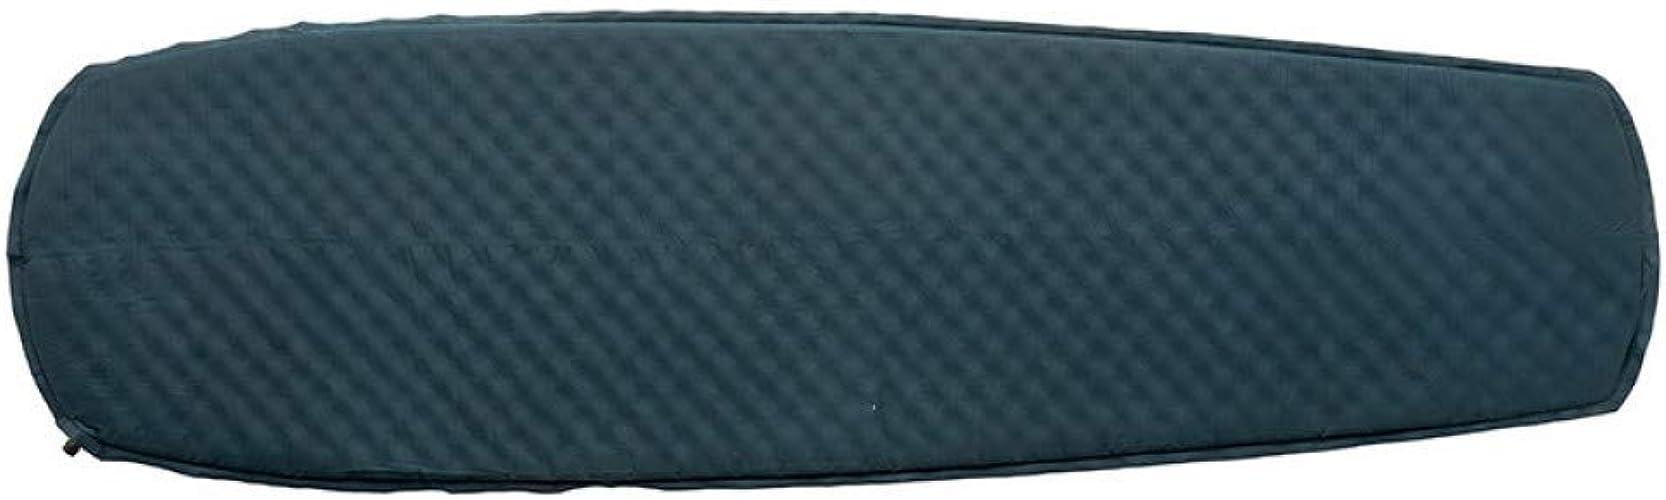 CLKSJOR Tapis de Camping Self Inflating Camping Mat Ultralight Anti-Slip TPU Oxford Fabric Durable Air Bed for Picnic